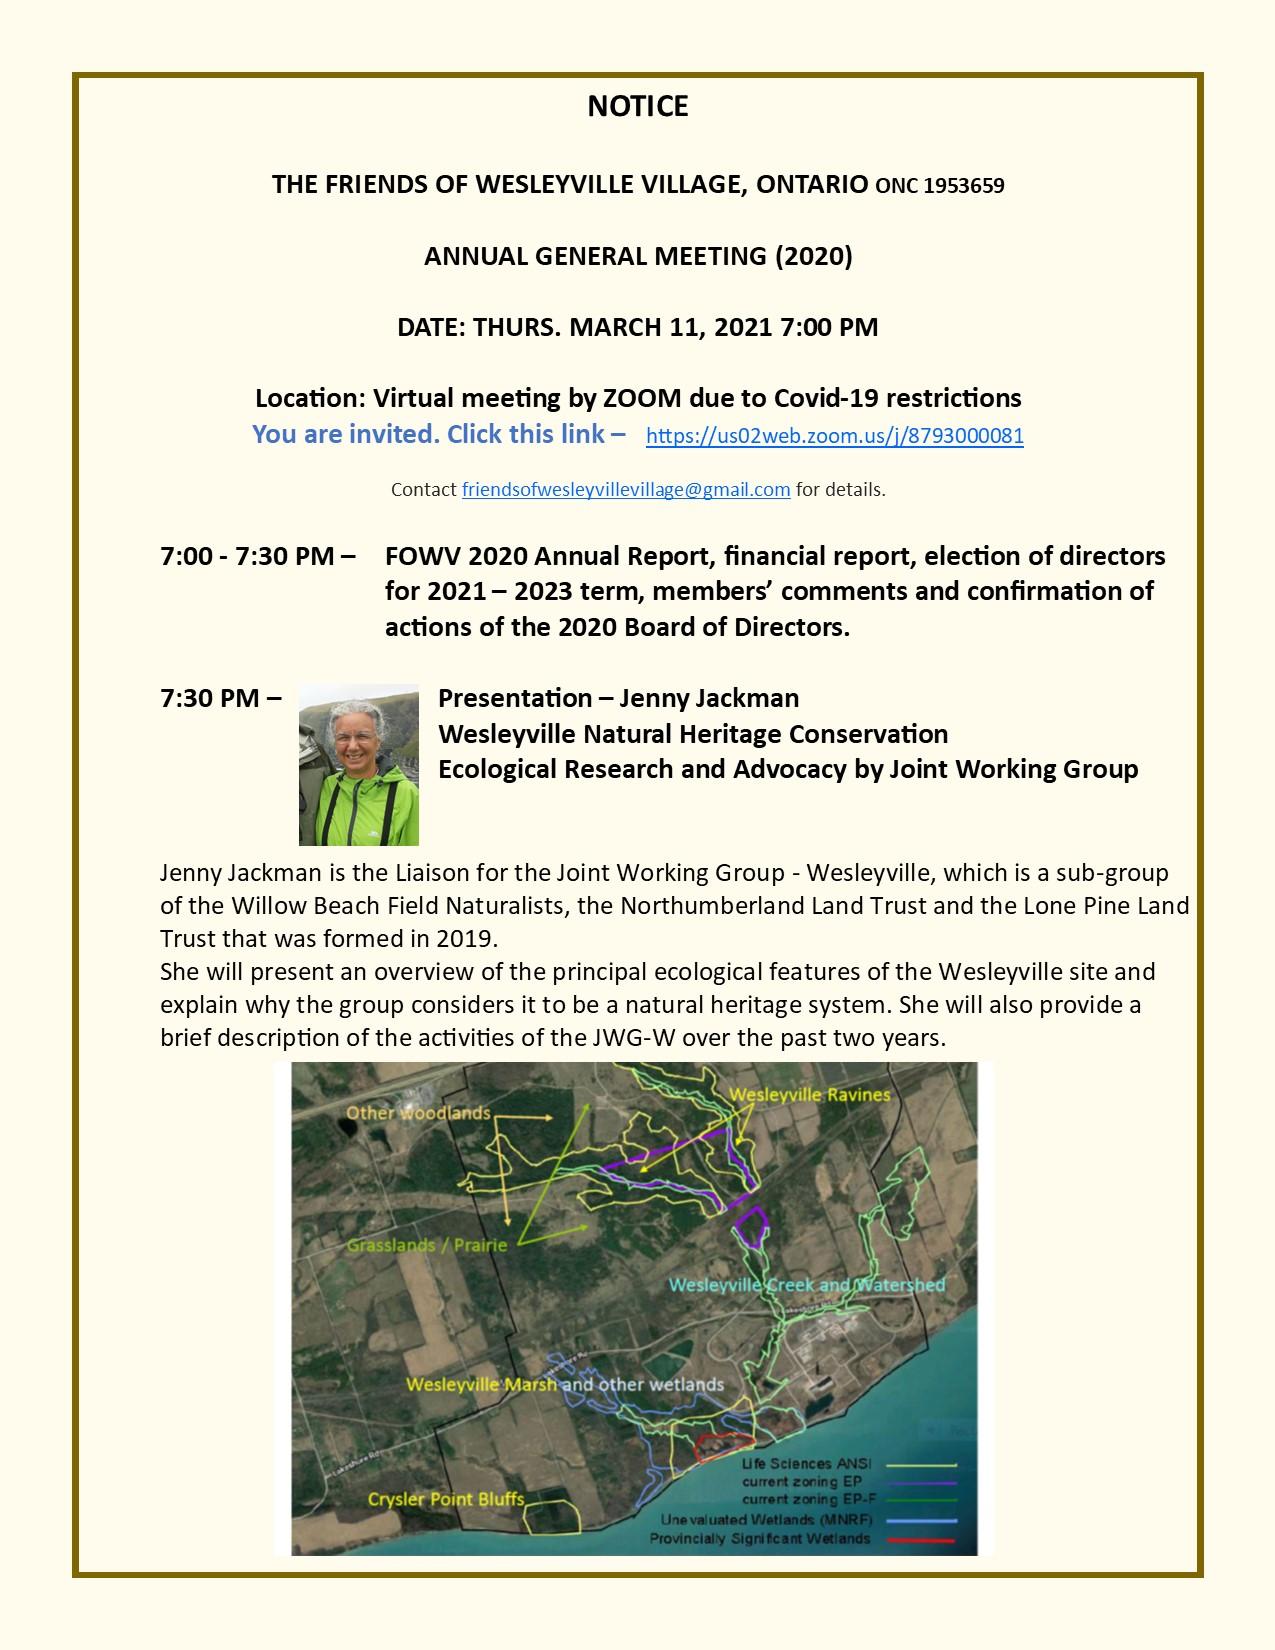 Friends of Wesleyville Village 2020 AGM